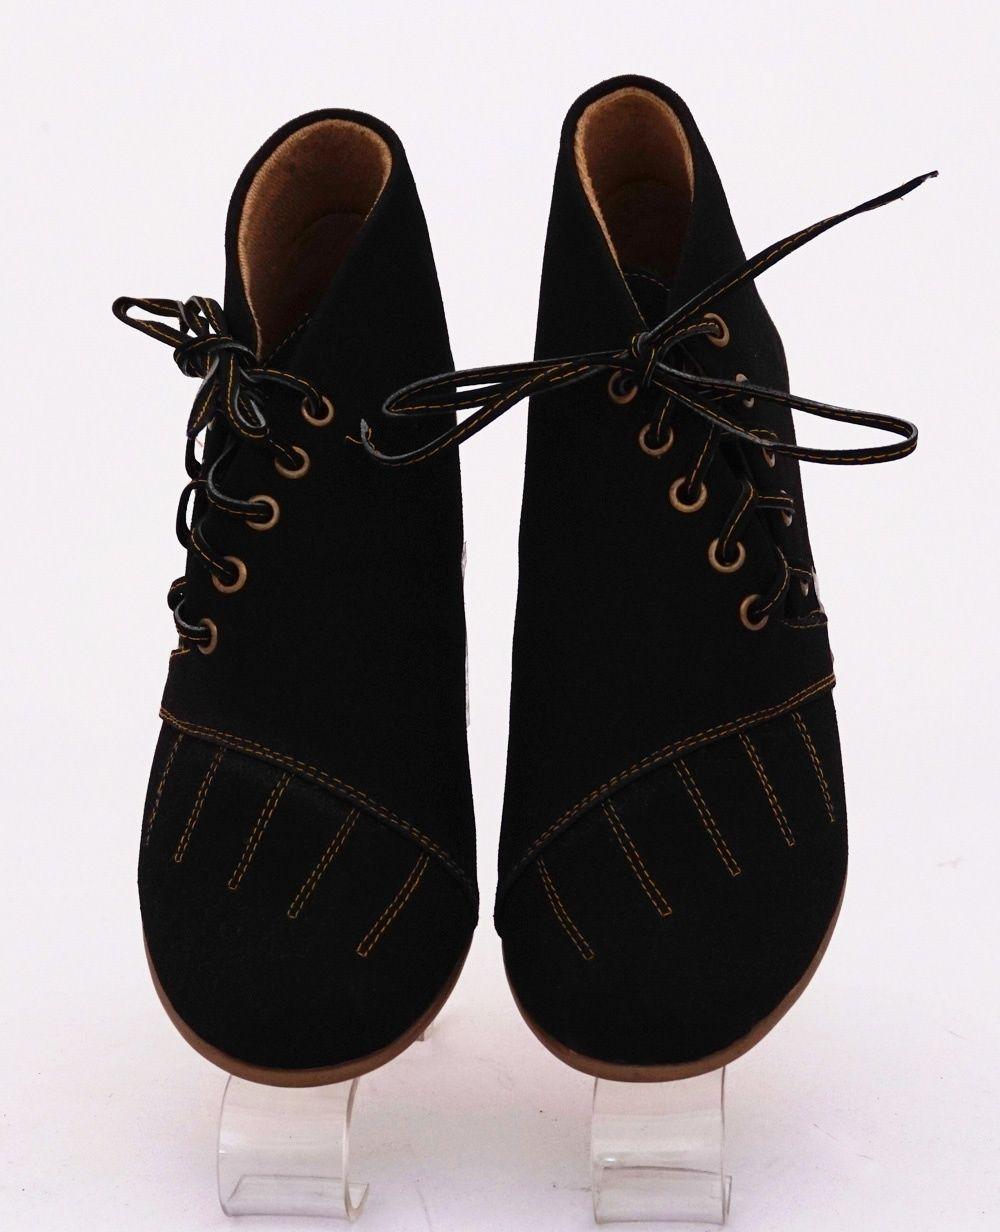 Mh07 Teplek Sepatu Harga 75 000 Grosir Sepatu Lokal 80 95